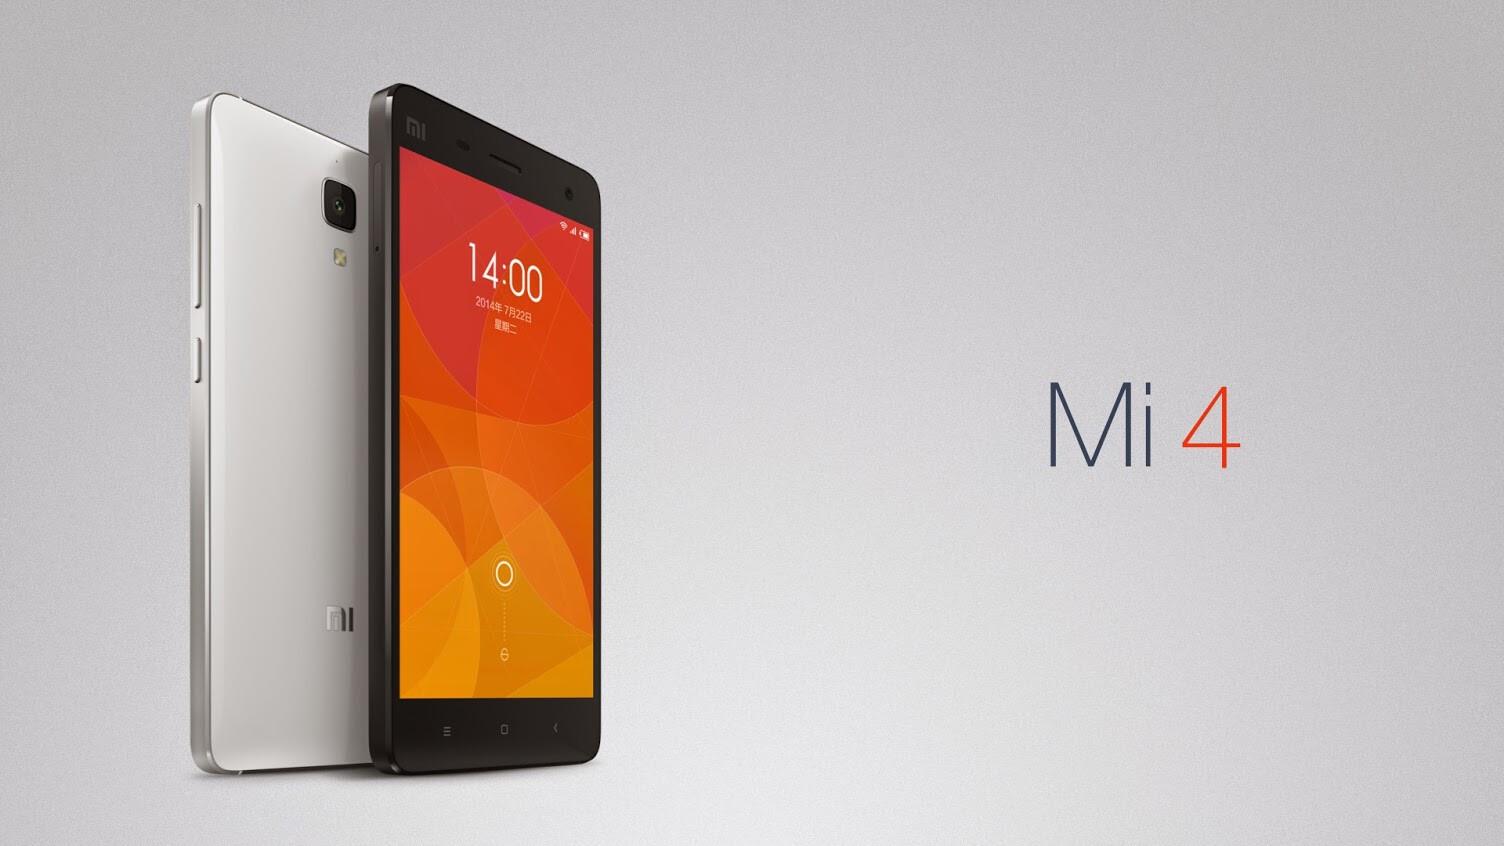 كل ما تريد معرفته عن هاتف Xiaomi Mi4 الجبار 1